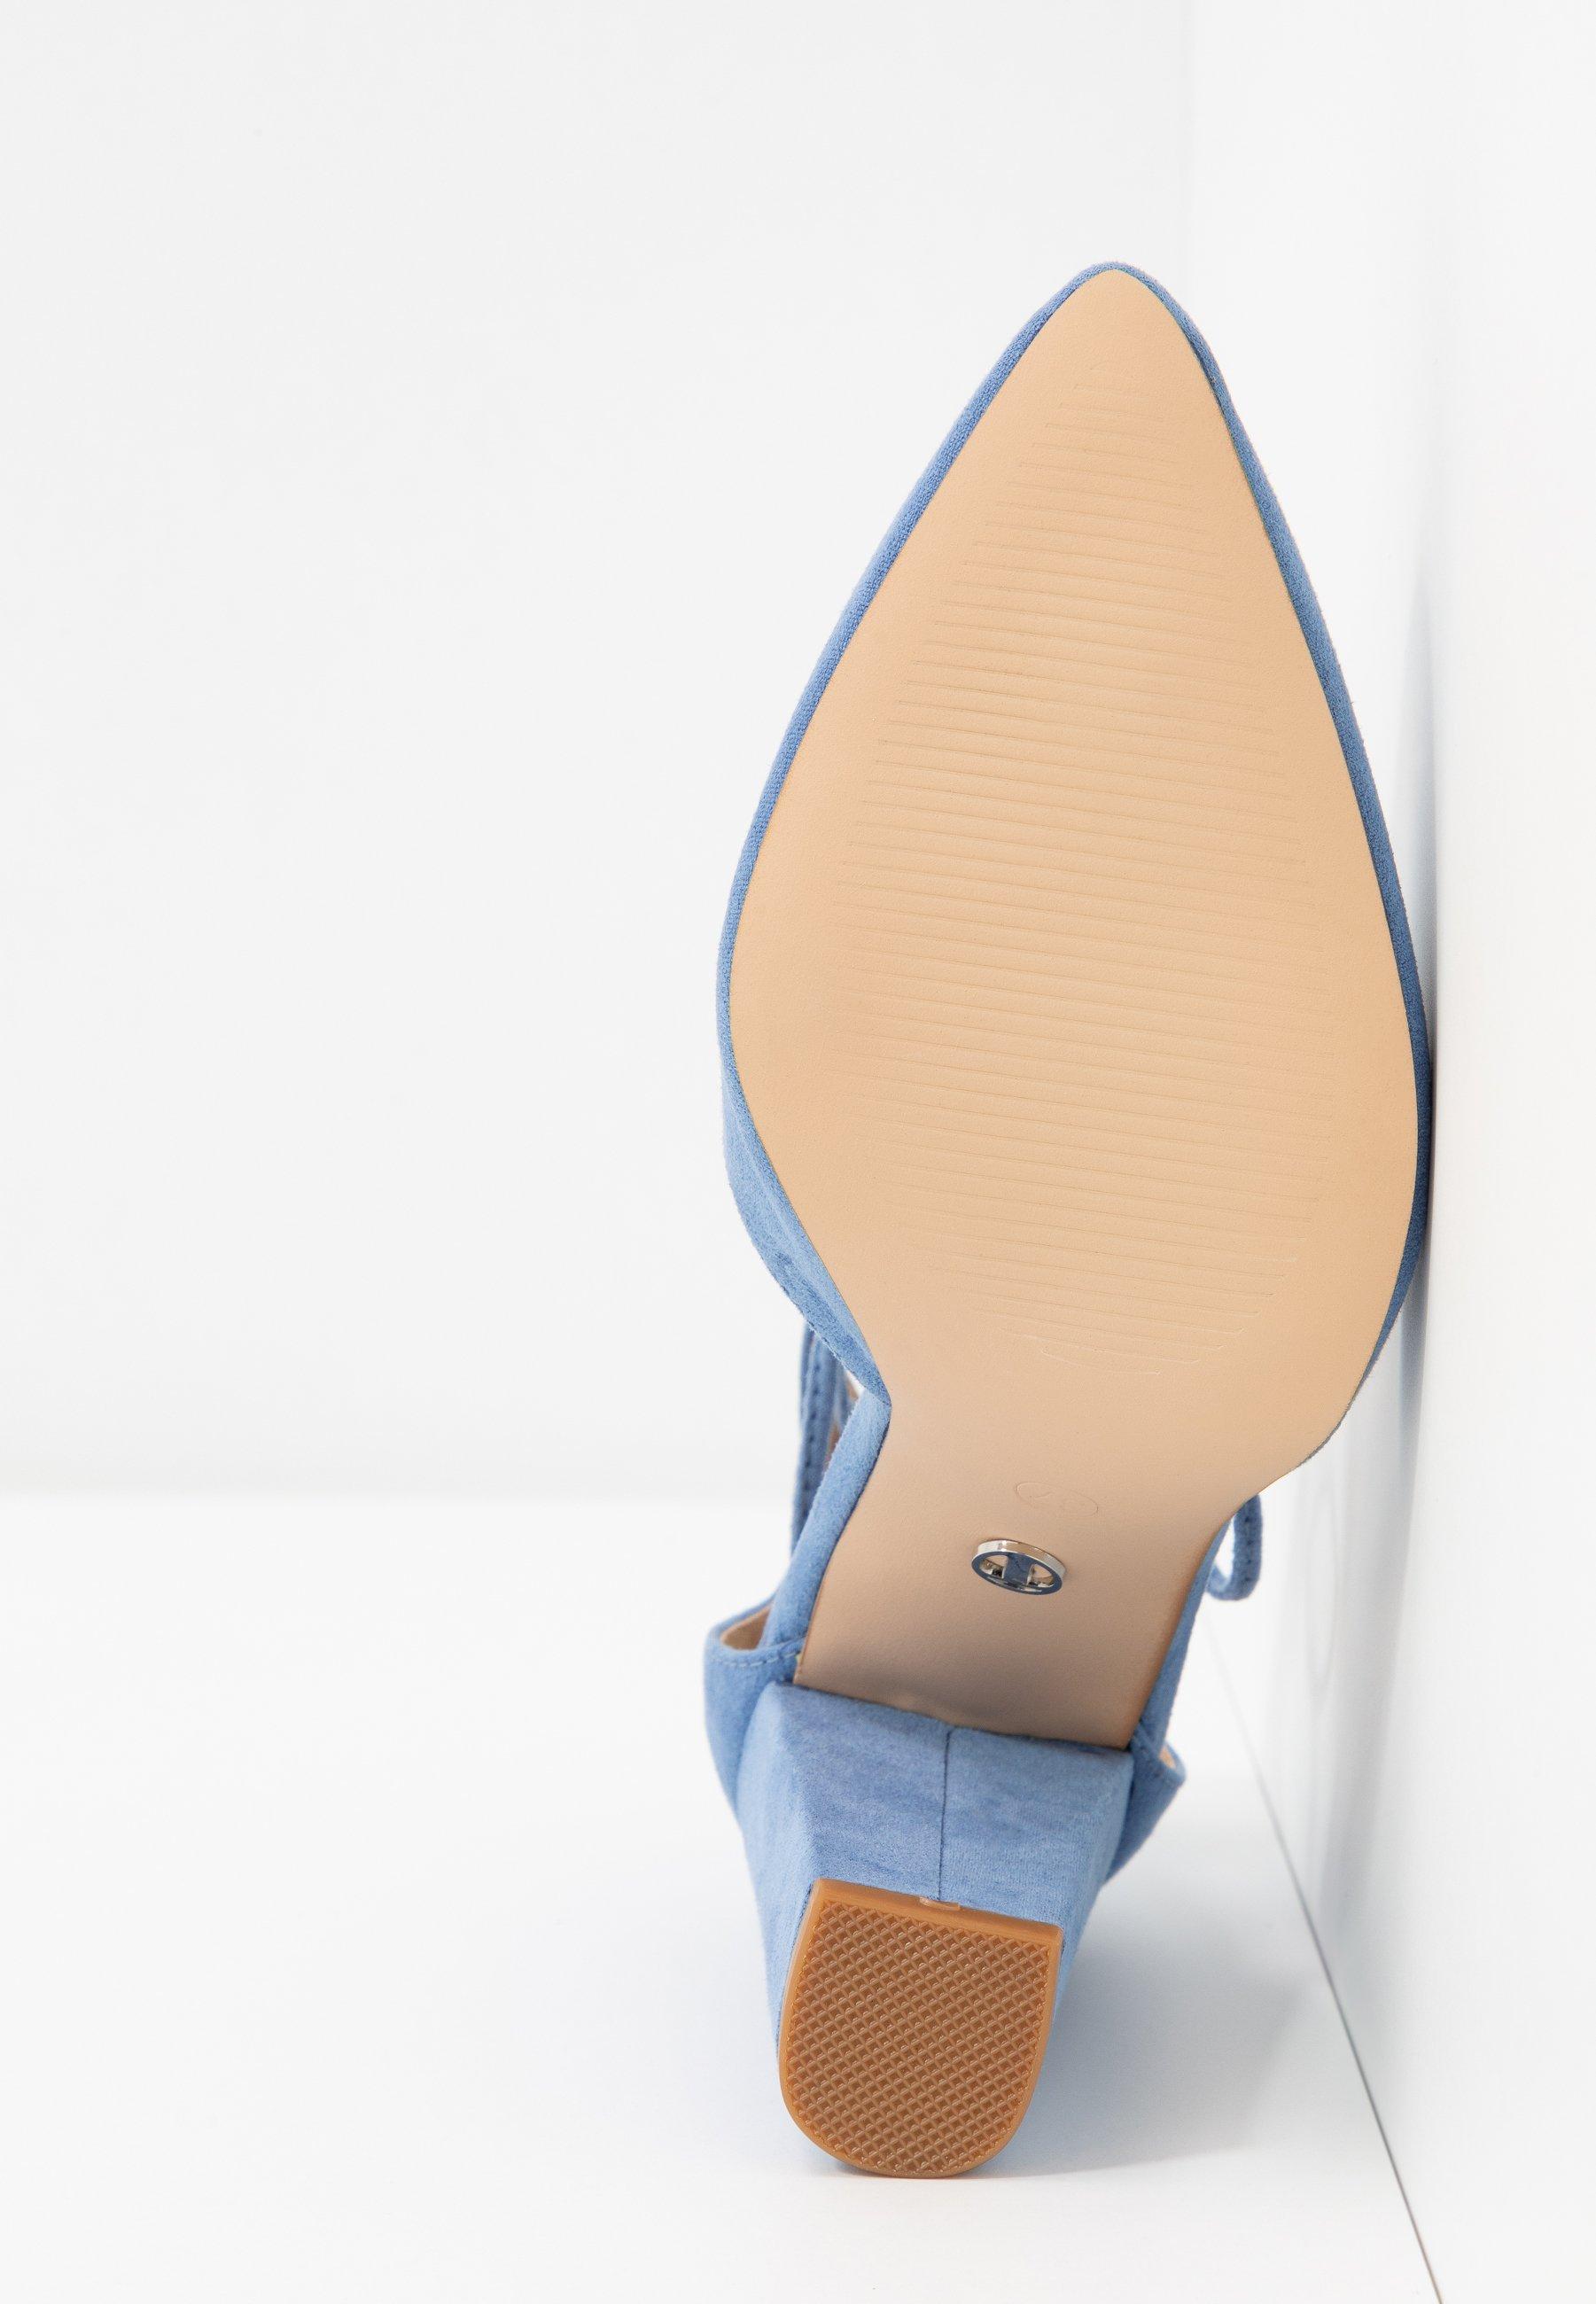 Tata Italia Højhælede Pumps - Blue